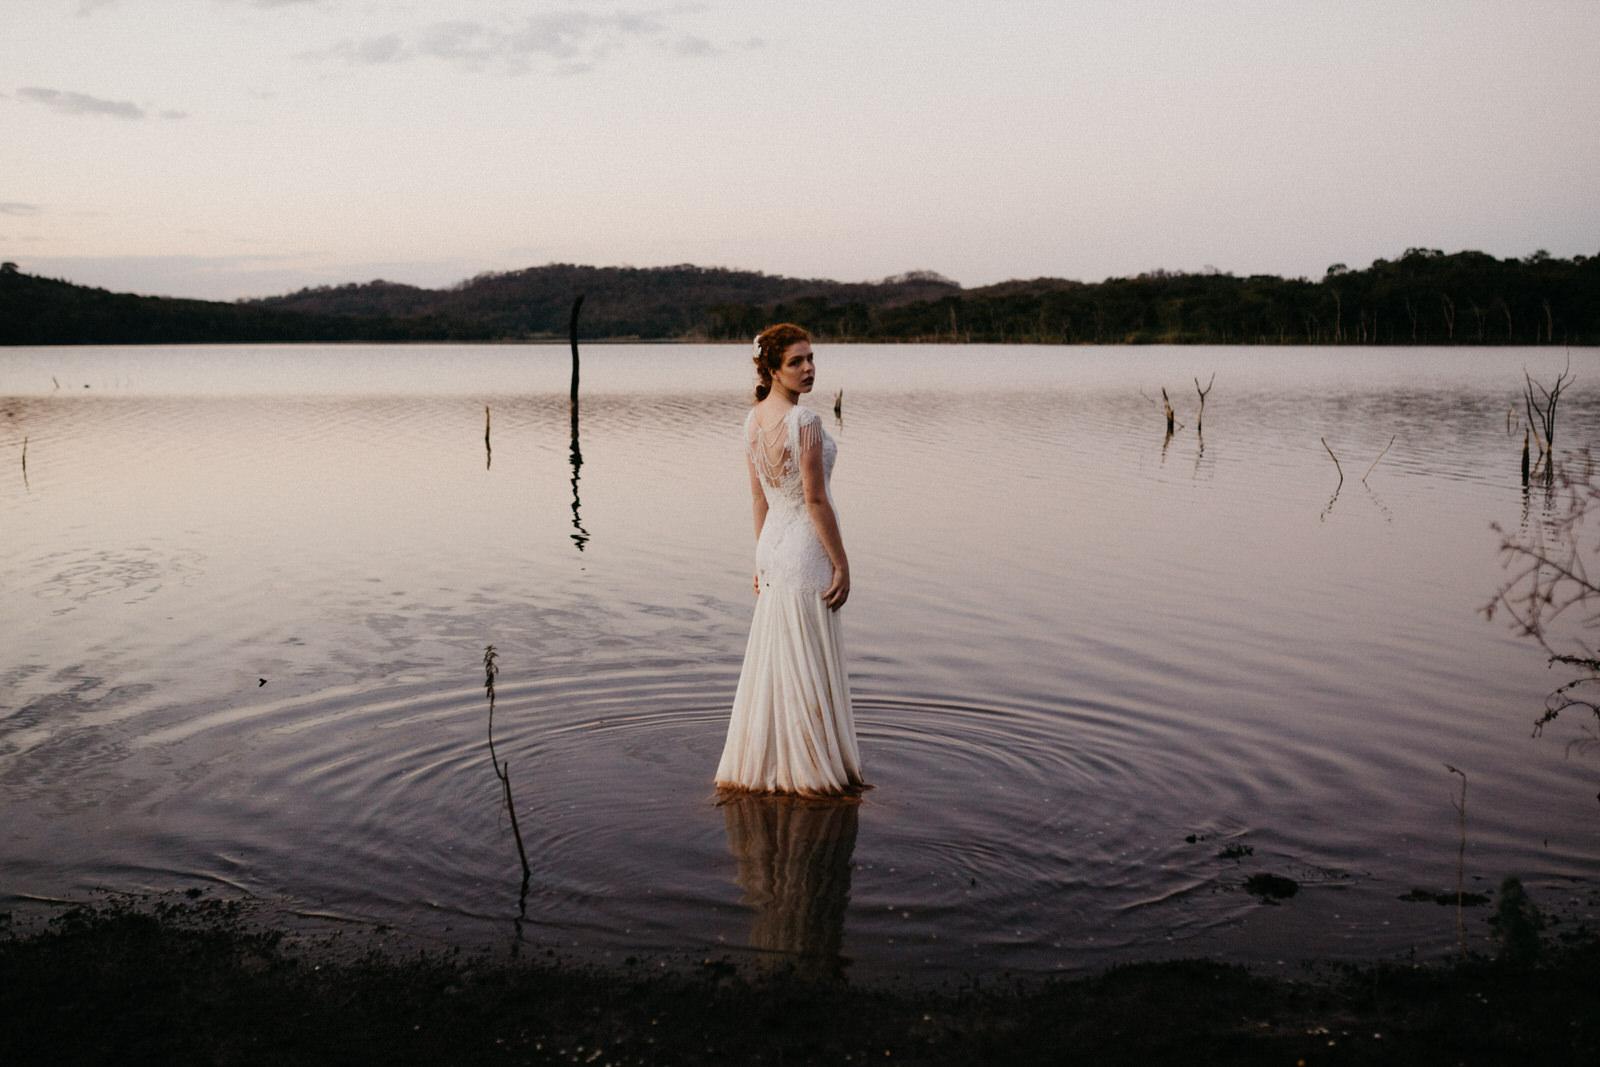 Céu_fotografia_casamentos_goiás_brasil_folk_noivas_brides_alternativo (77).jpg